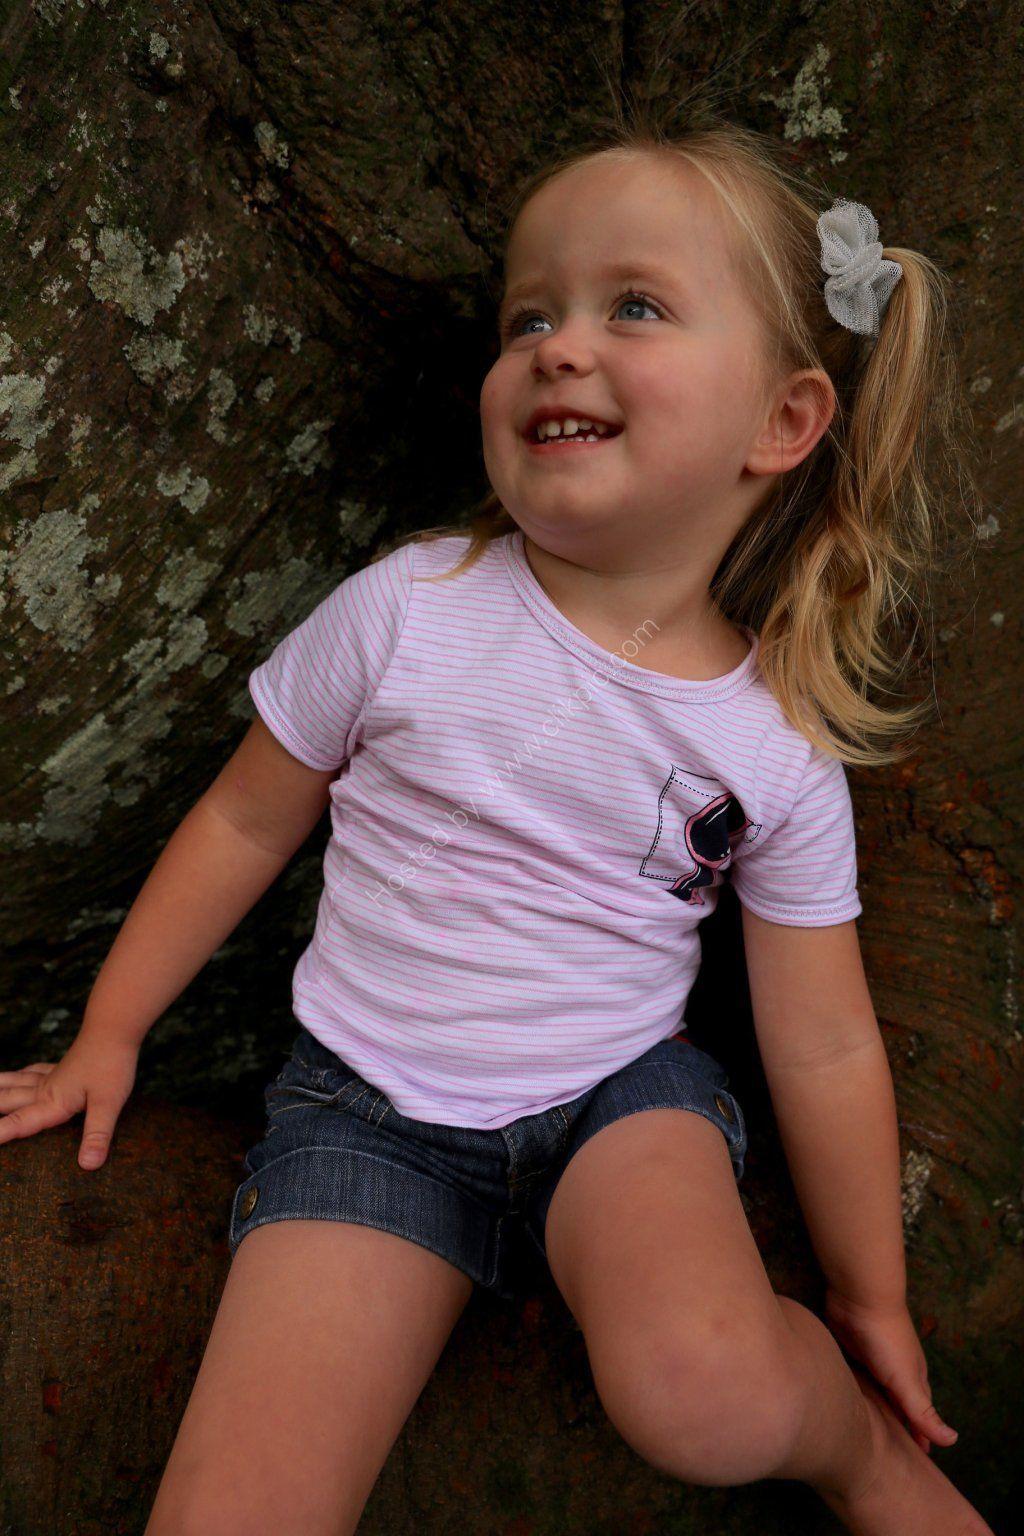 Natalie aged 2